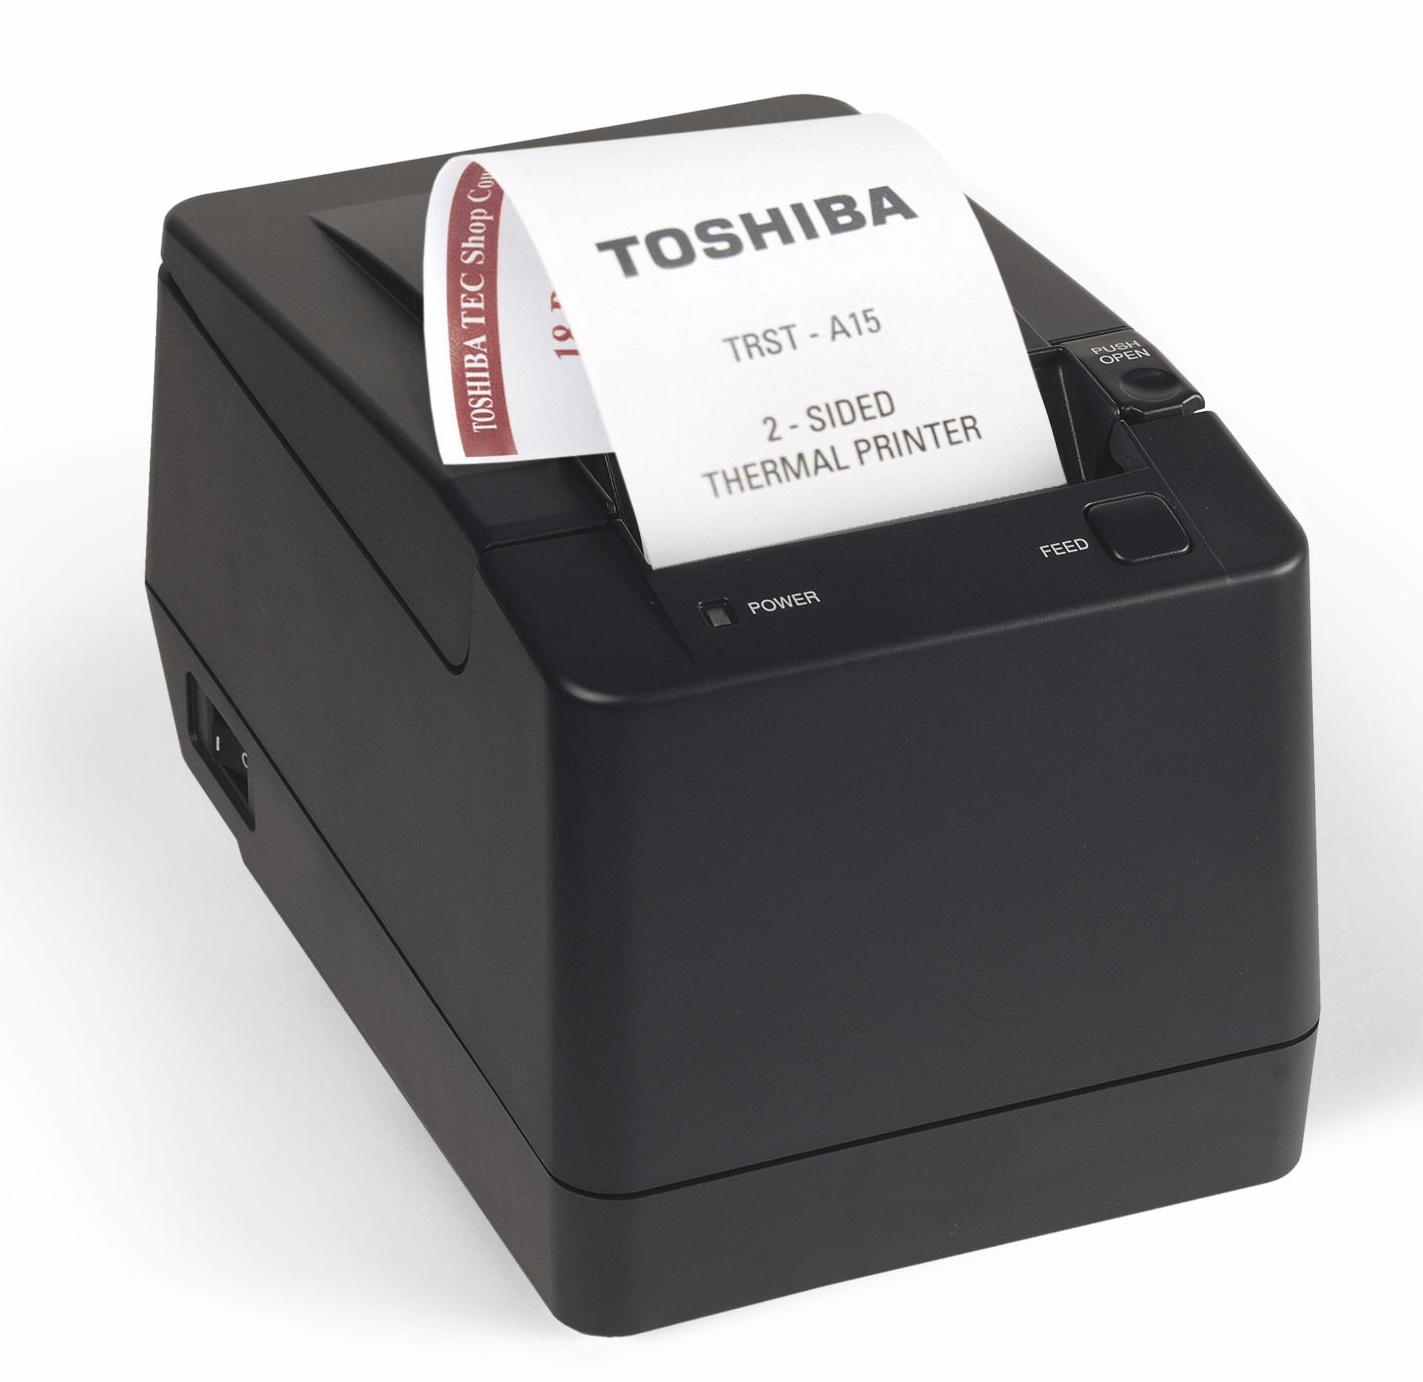 Toshiba TEC TRST-A15 EPOS Printer